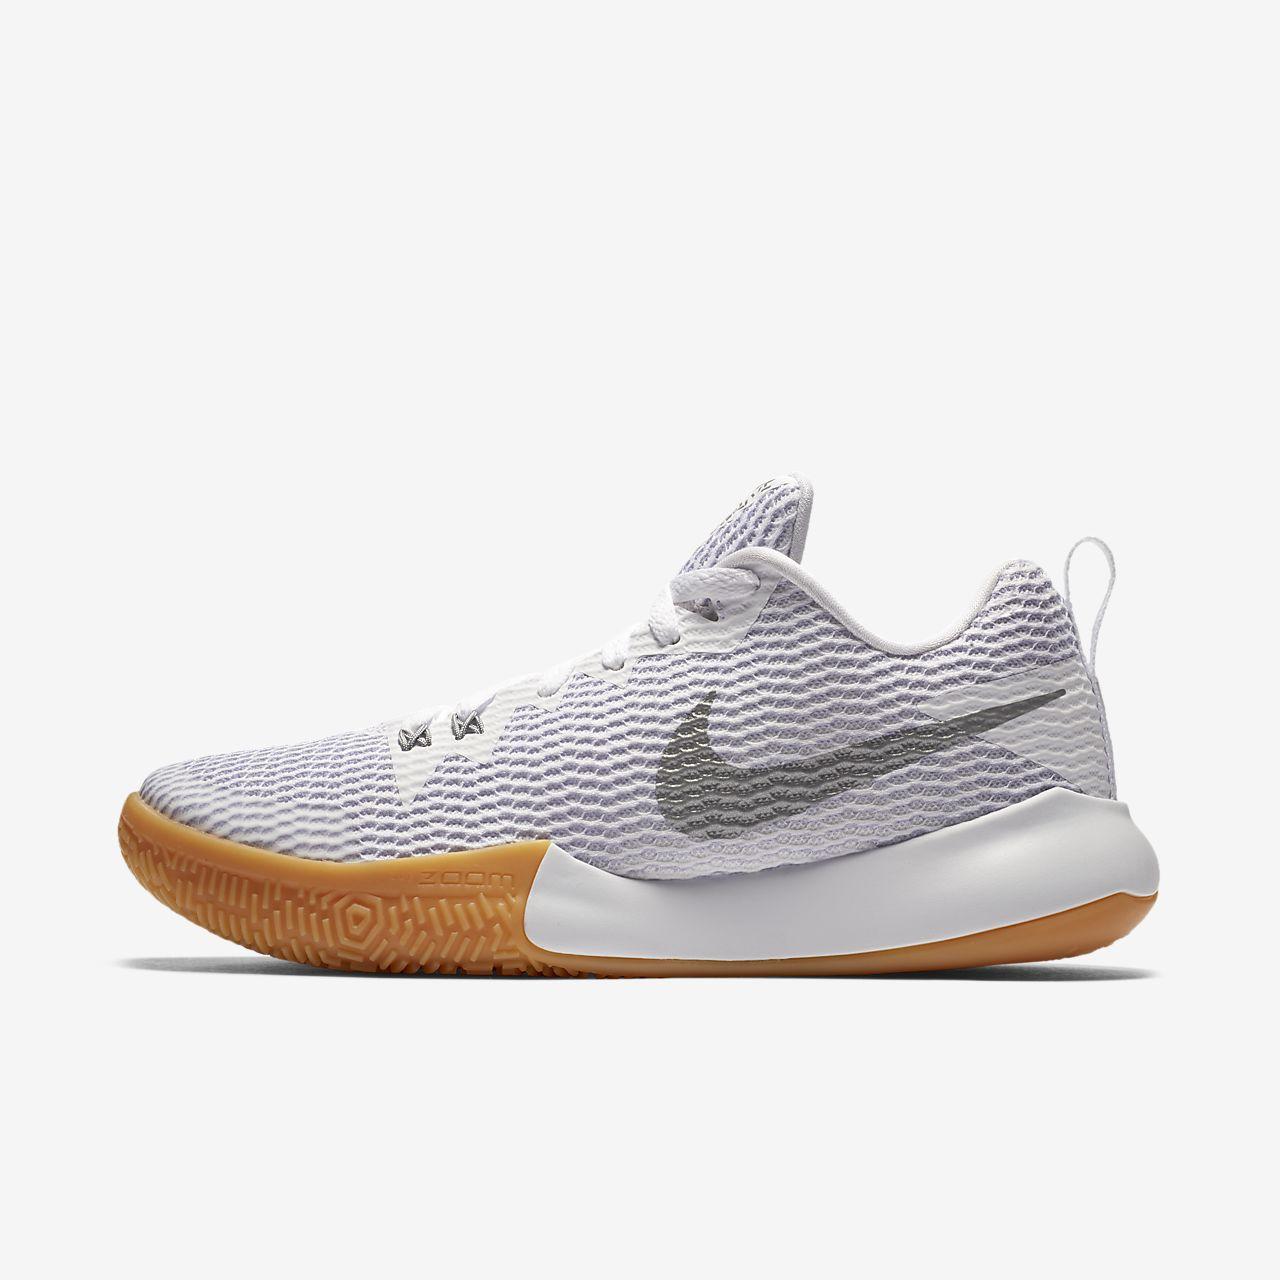 Basketsko Nike Zoom Live II för kvinnor